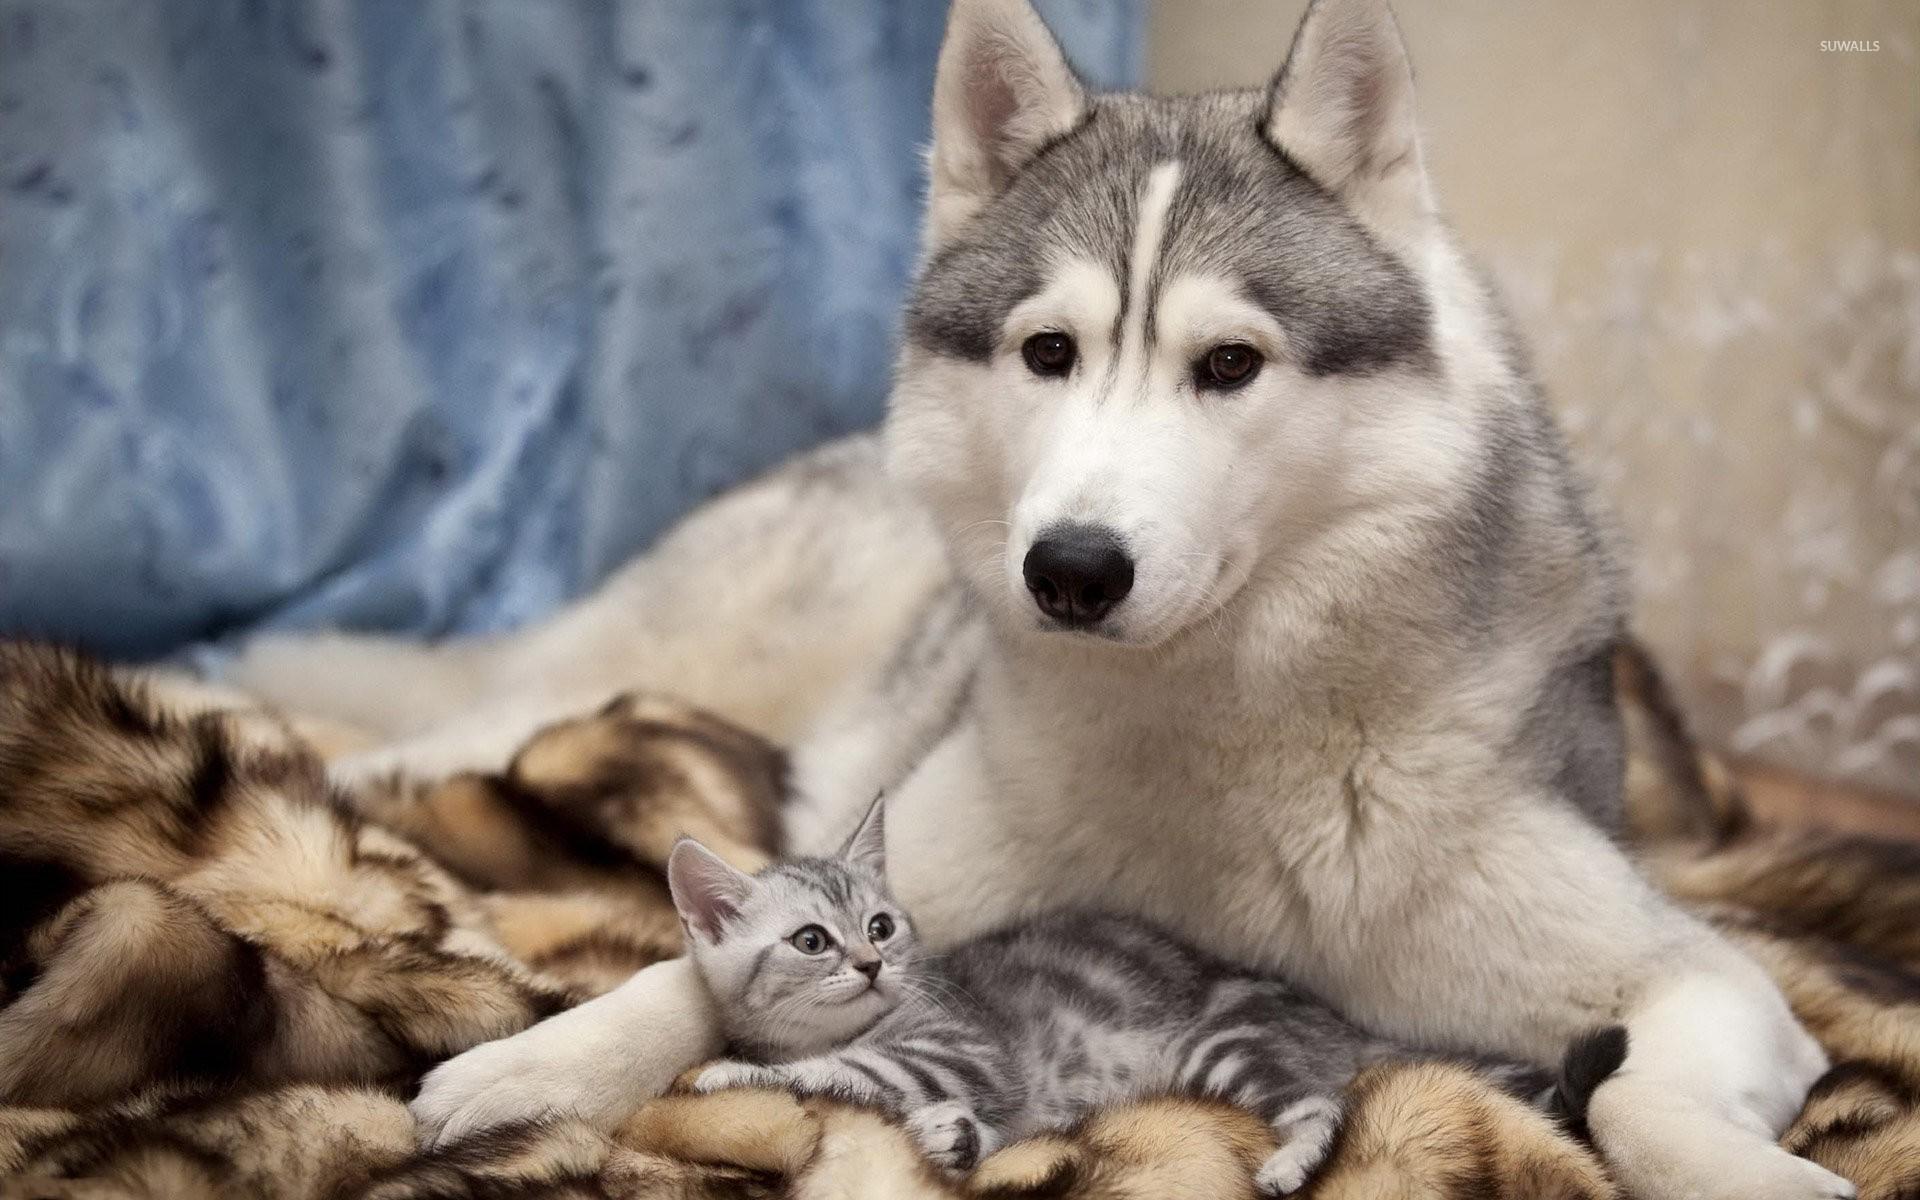 Siberian Husky with a kitten wallpaper jpg